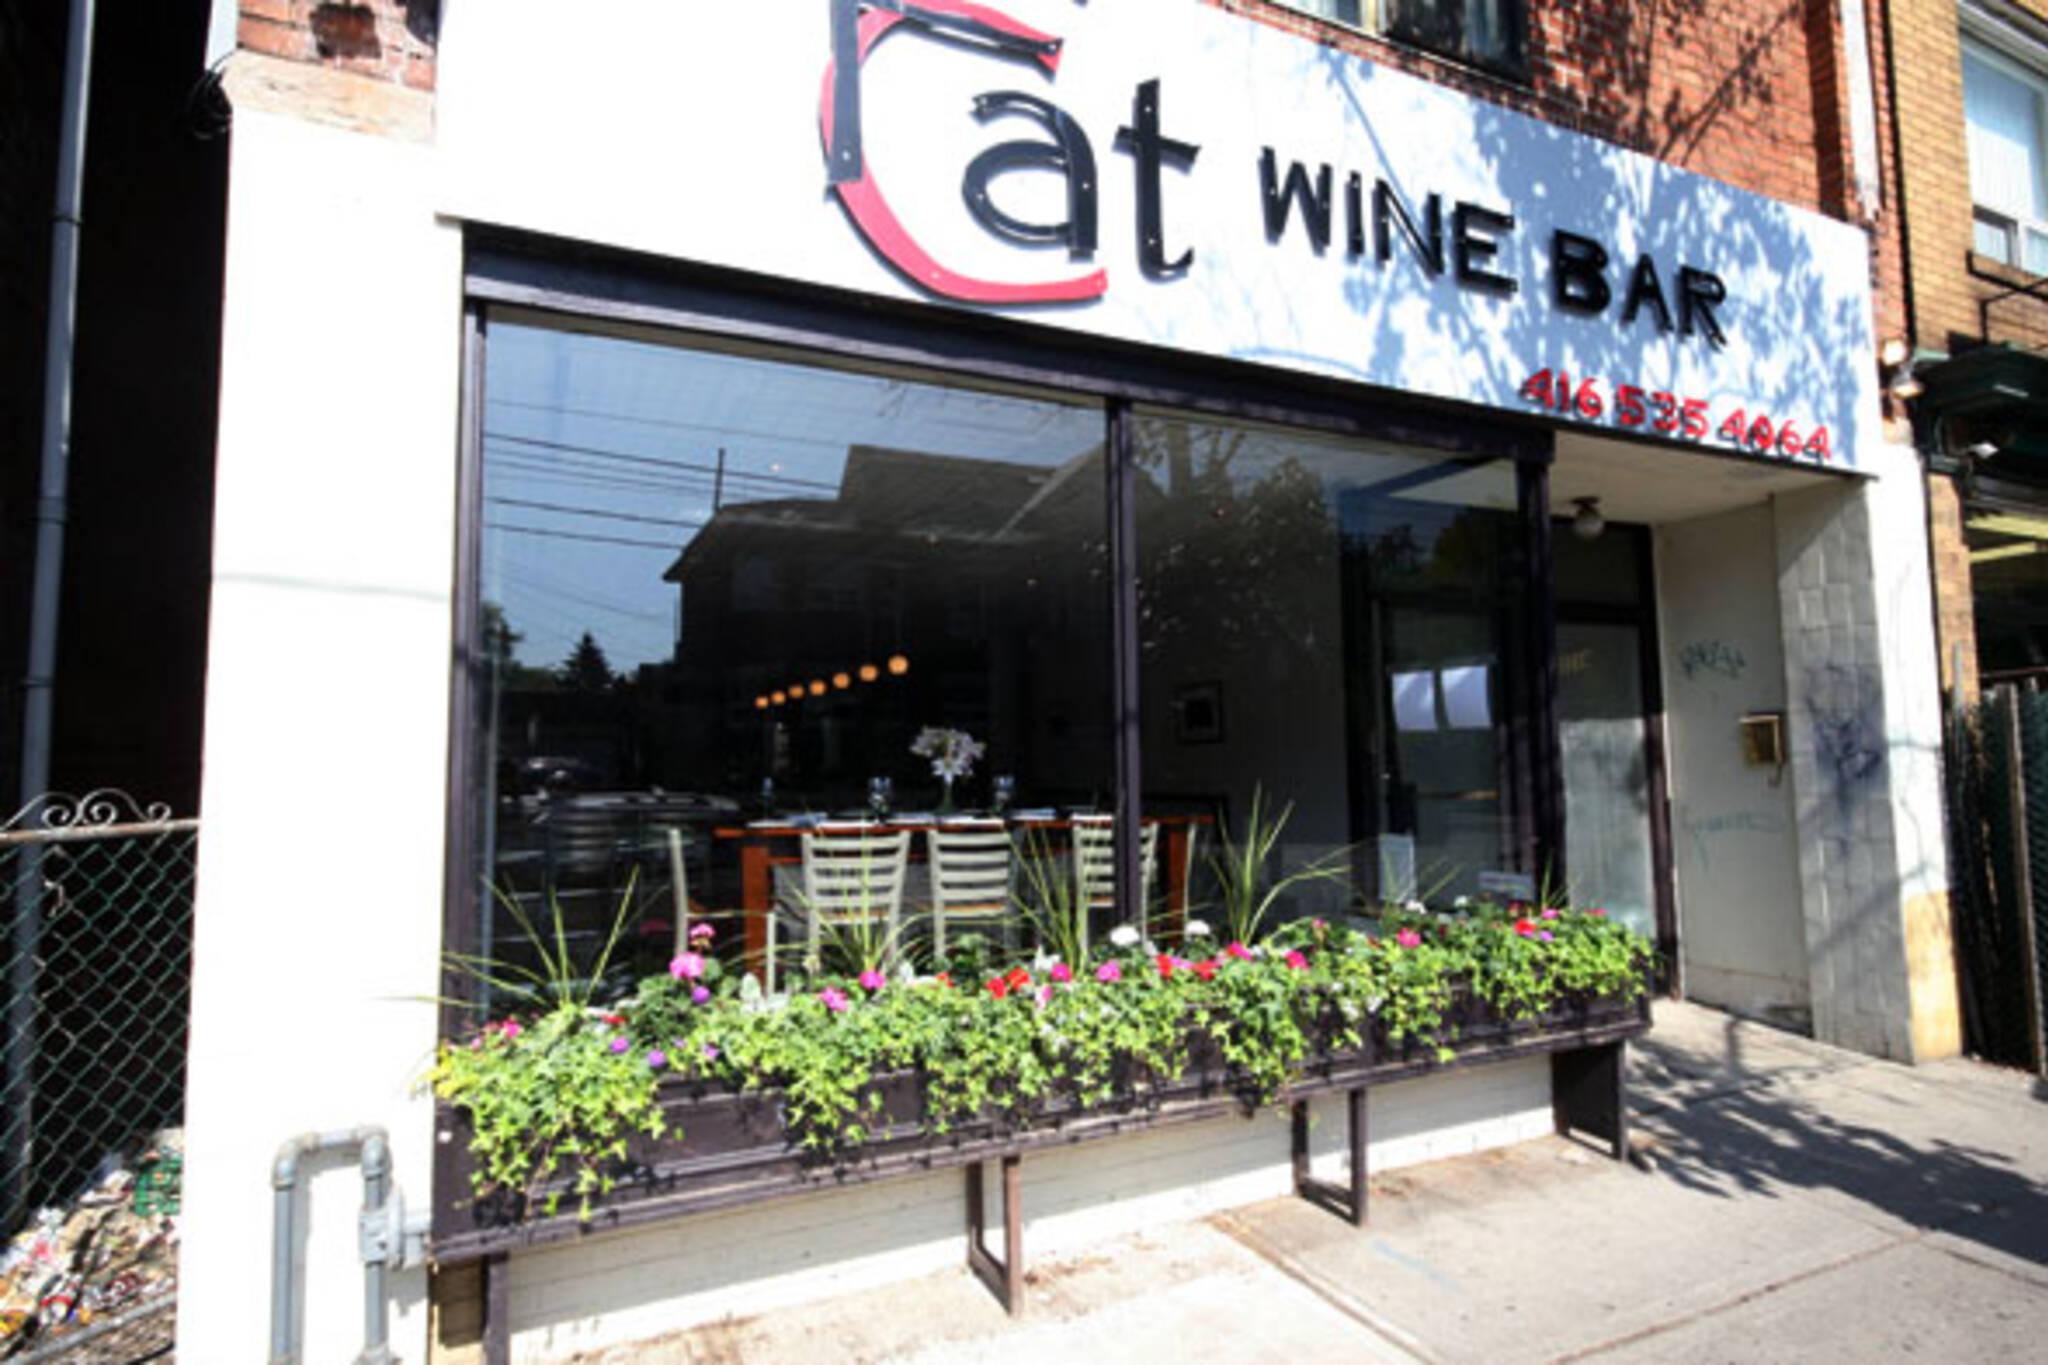 Fat Cat Wine Bar